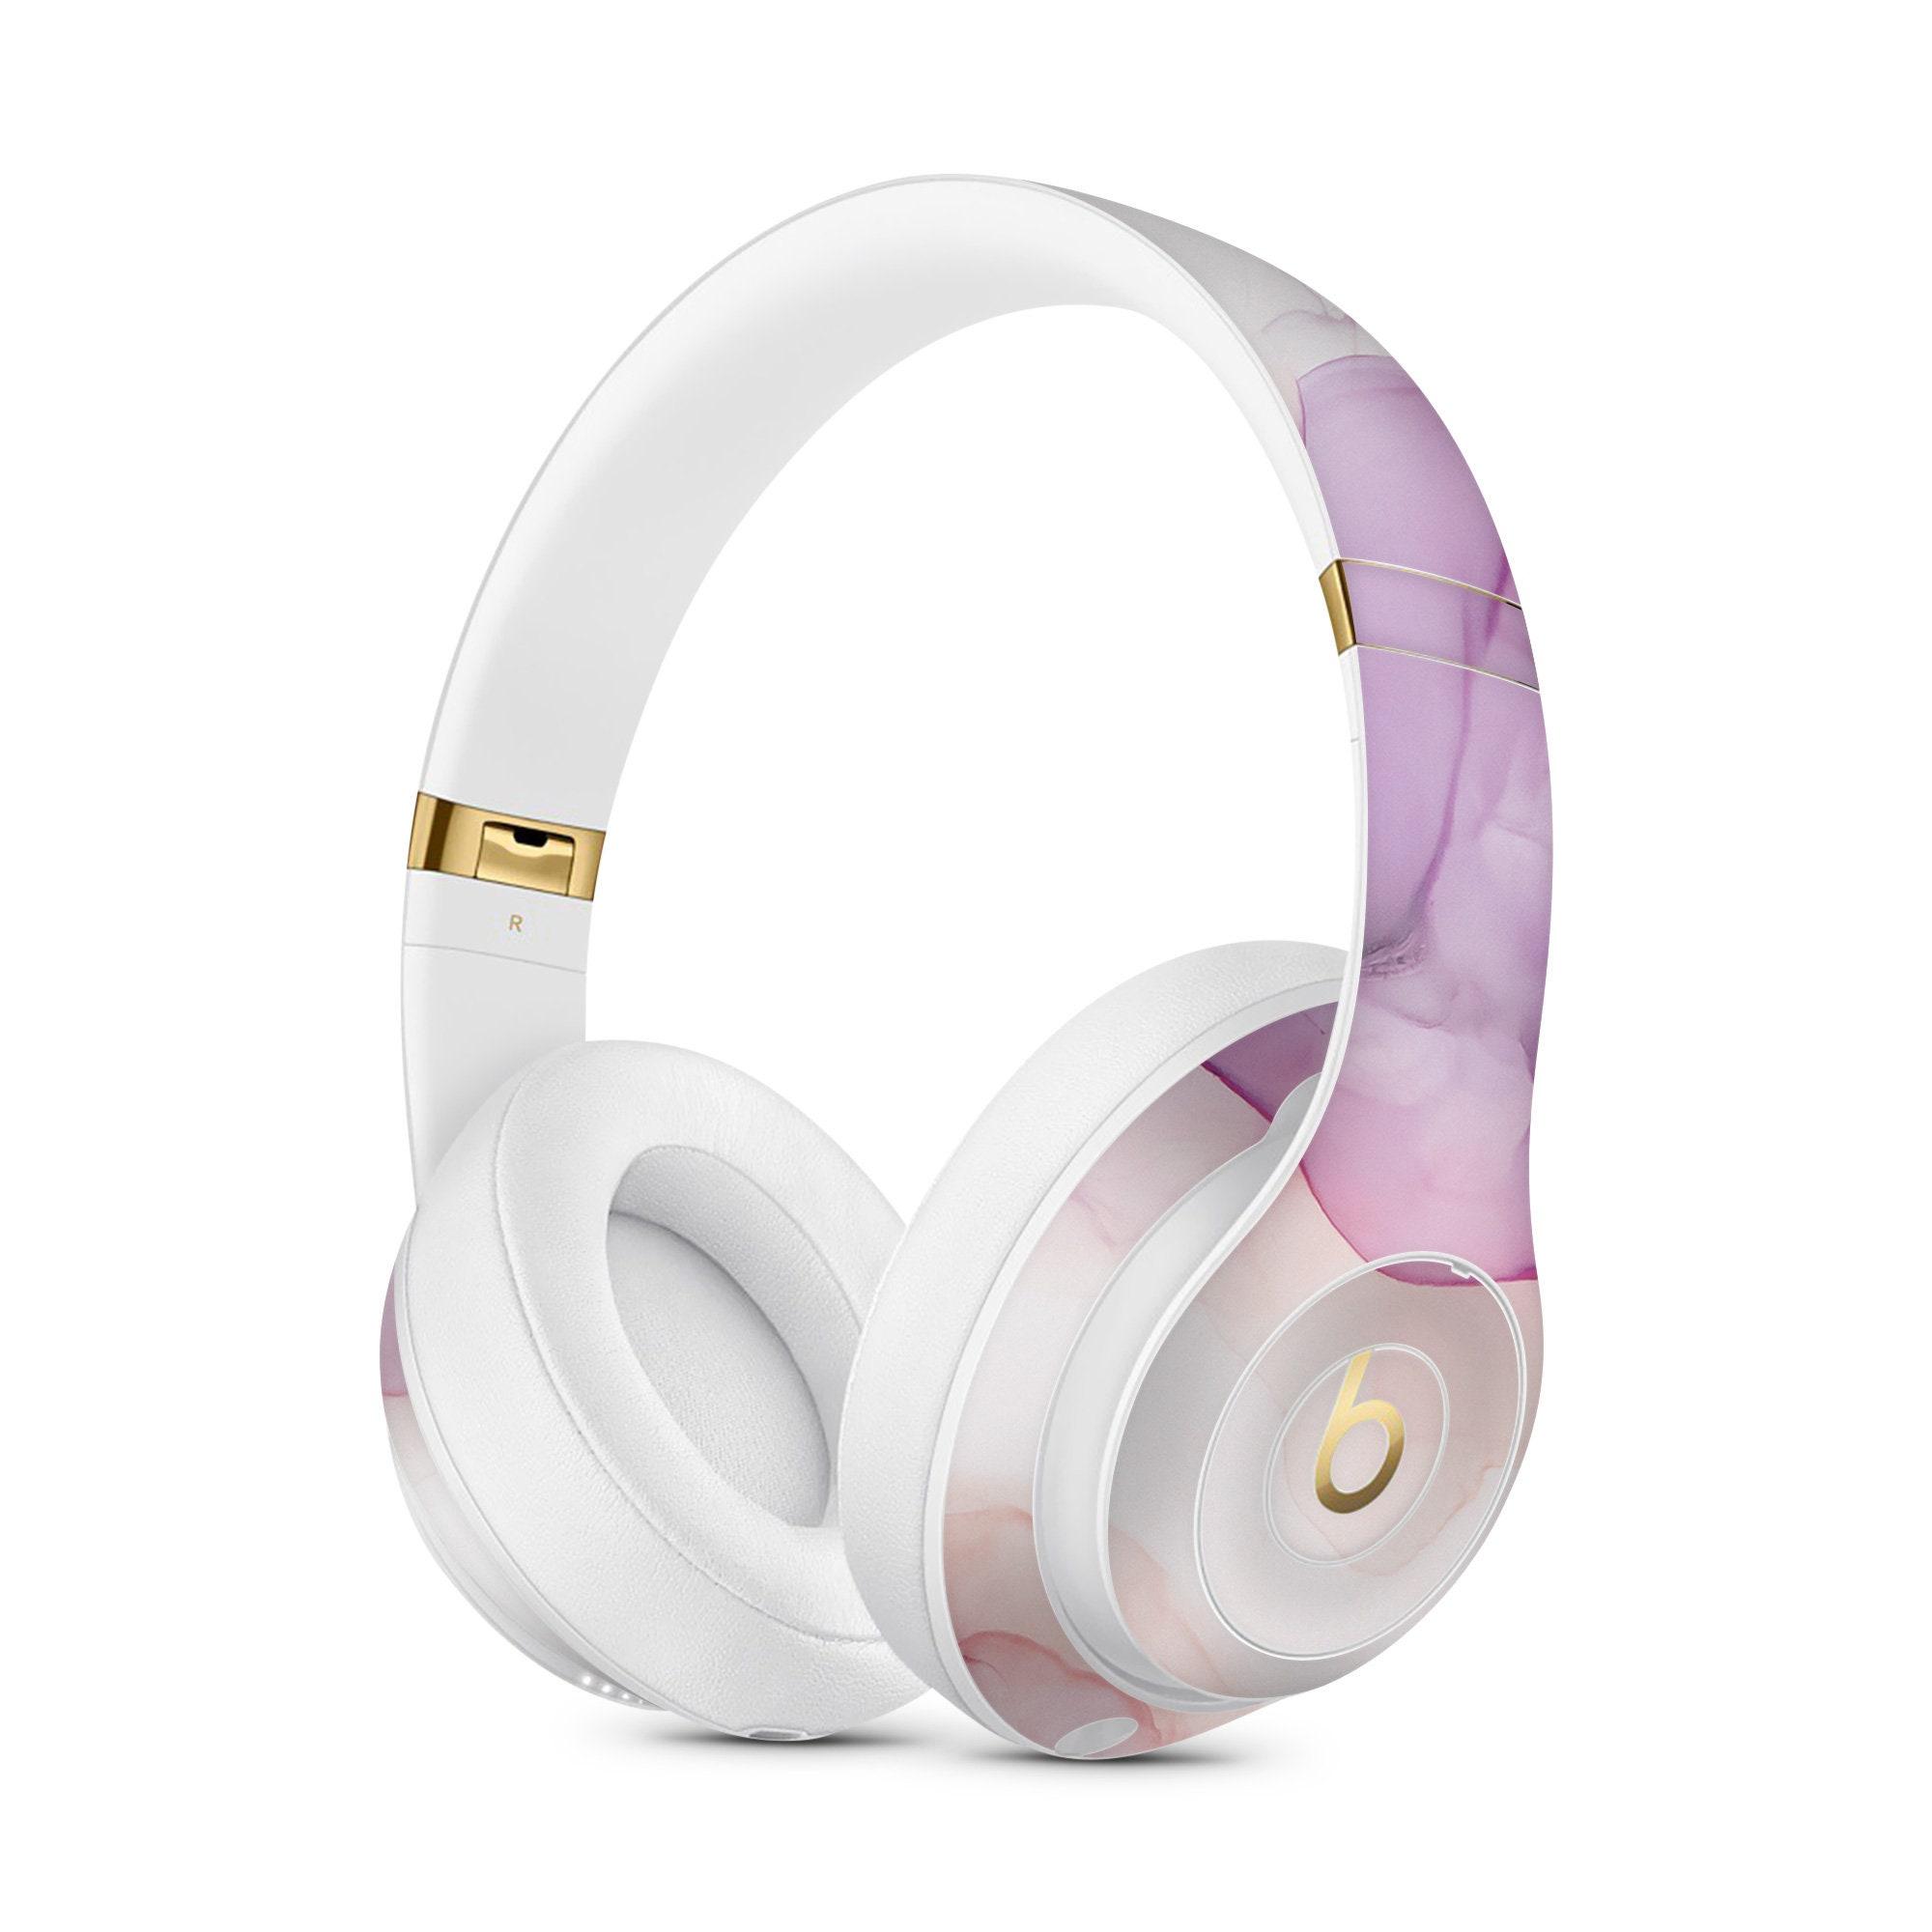 Amethyst Ink Marble Vinyl Skin Decal For Apple Beats Studio 3 A1914 Apple Beats Solo 3 A1796 Wireless Powerbeats 3 Bose 700